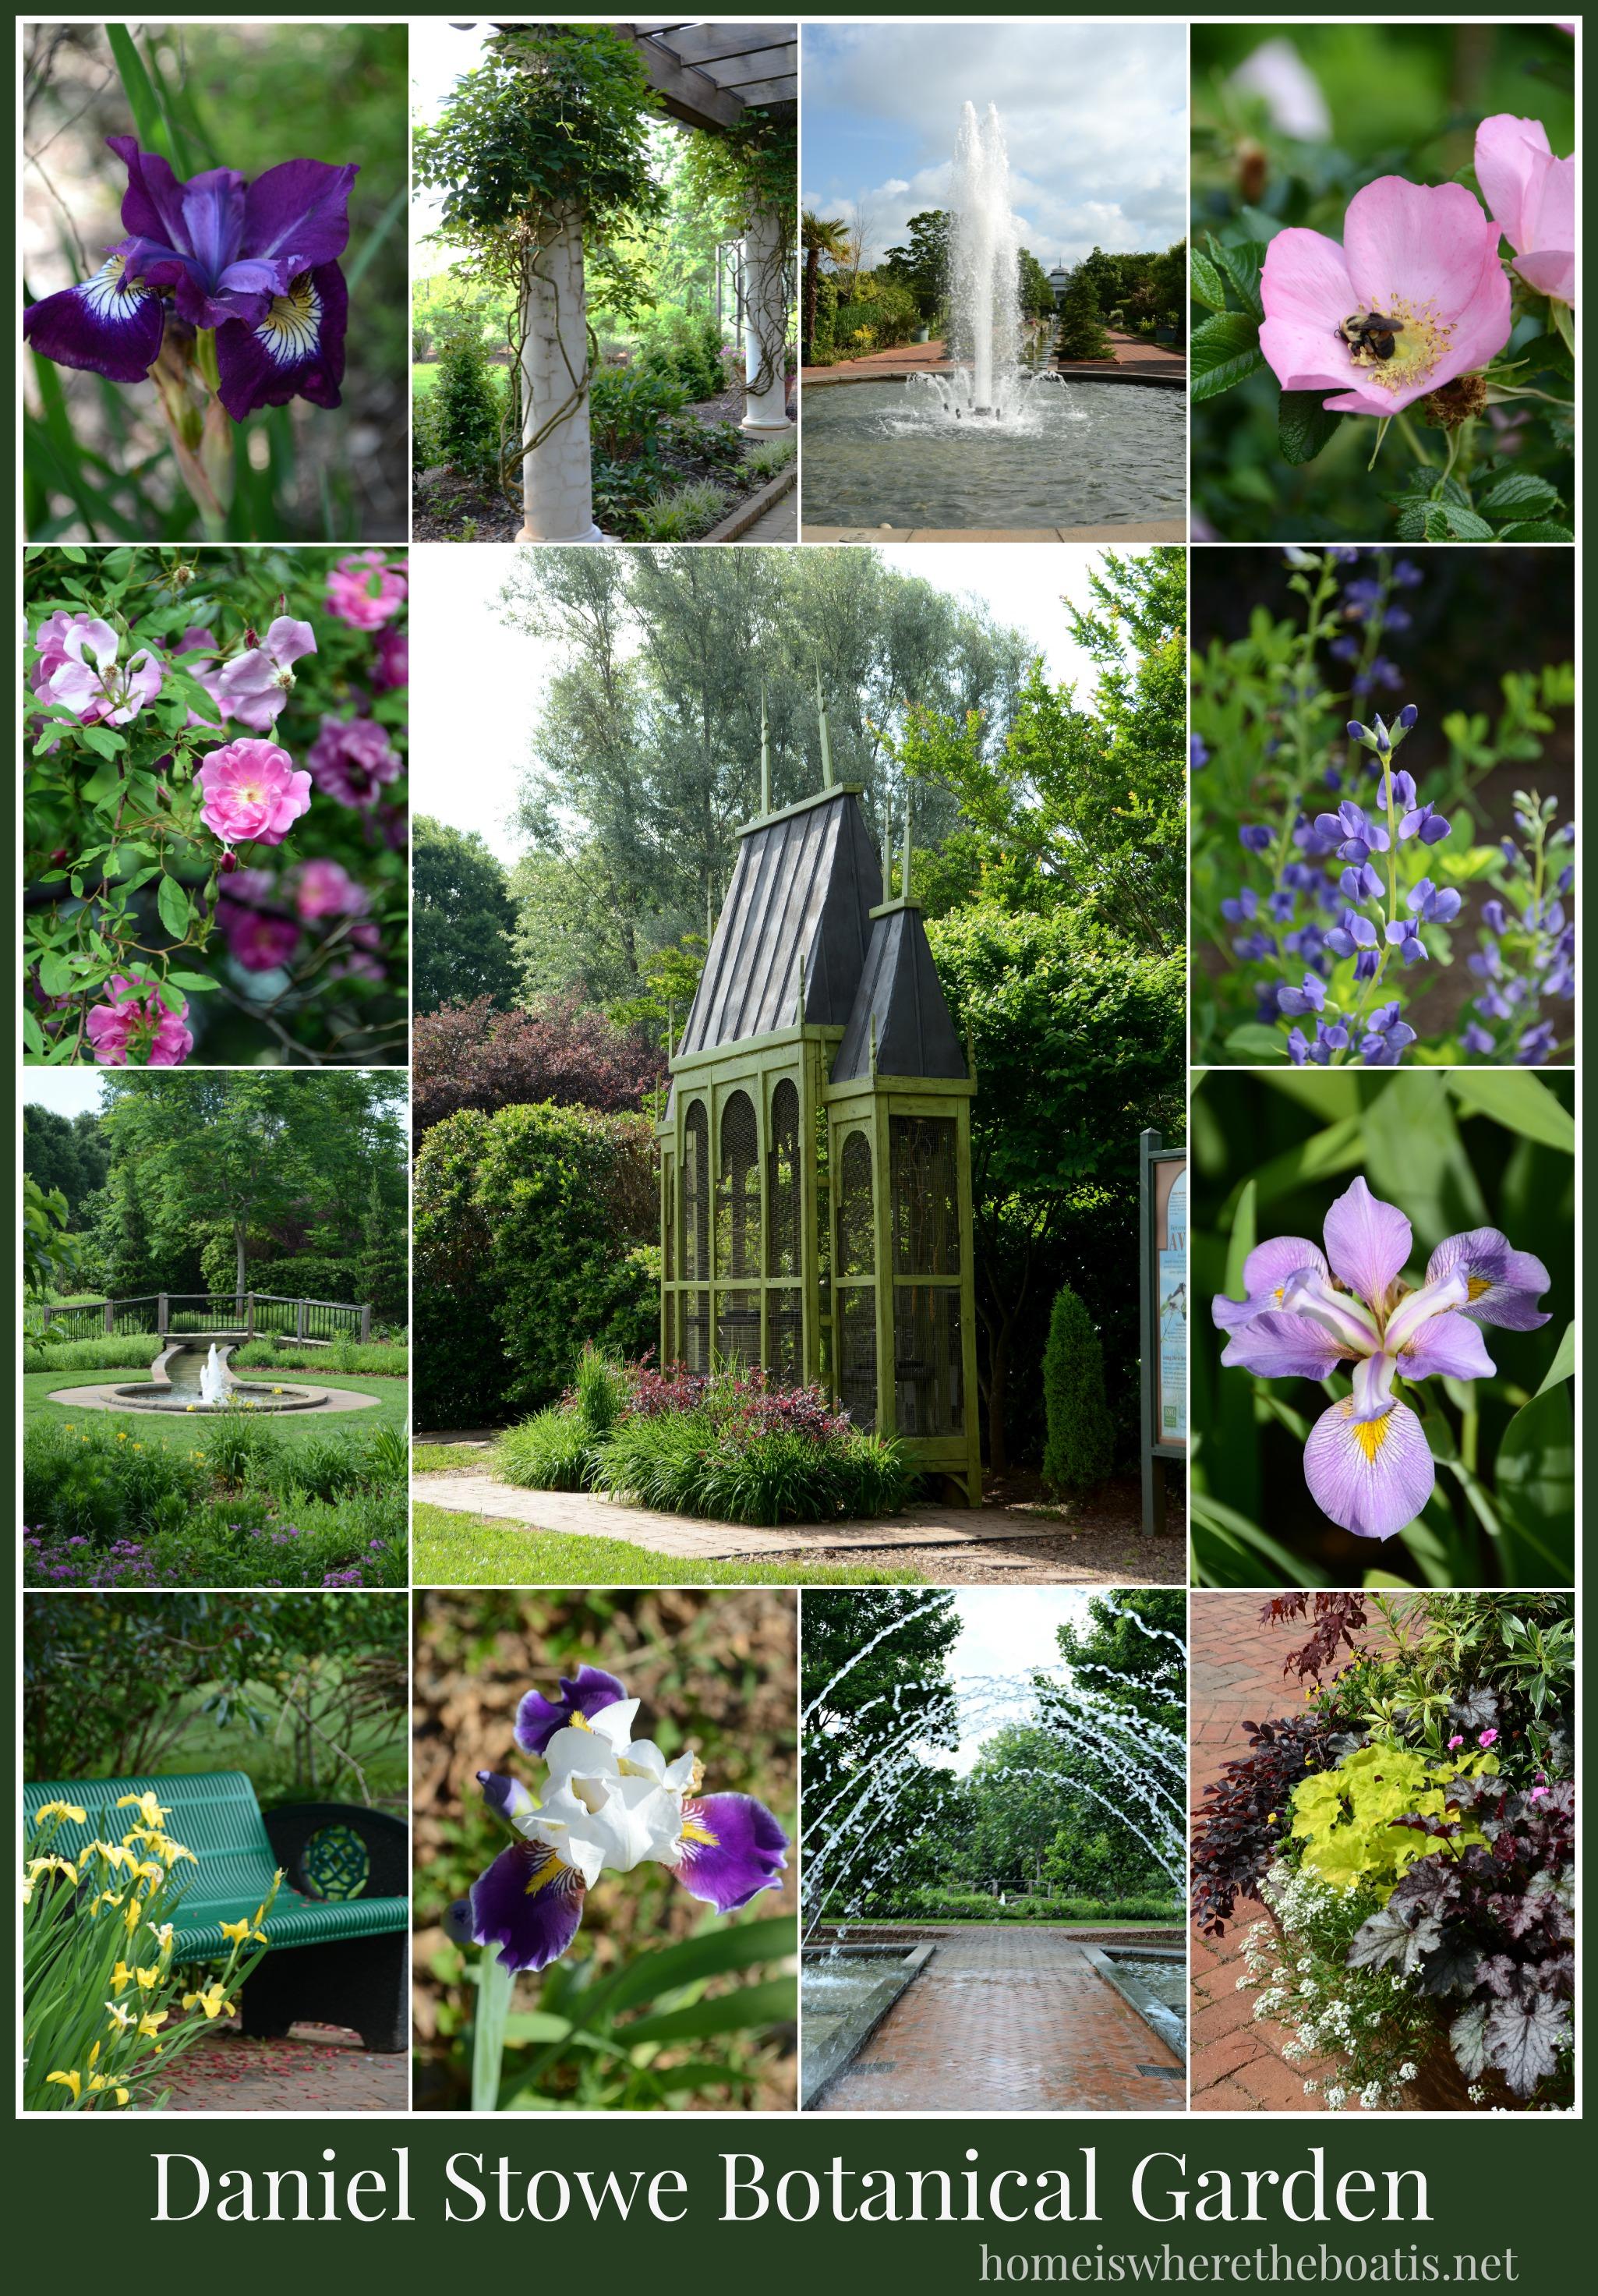 A Visit To Daniel Stowe Botanical Garden